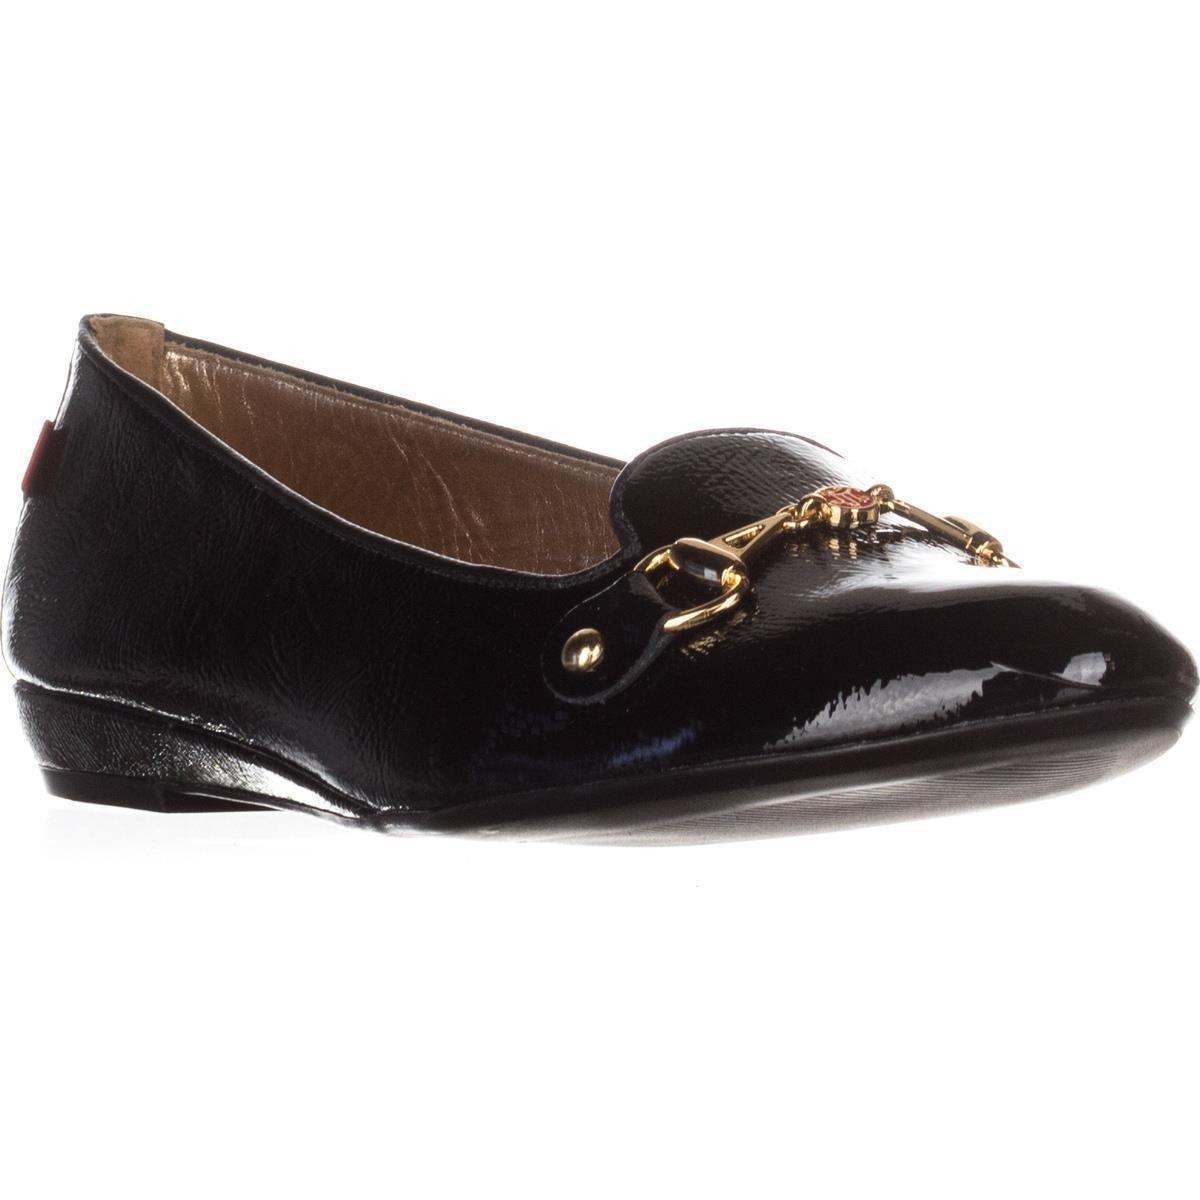 Marc Joseph New York Bryant Frauen Bryant York Park Loafers schwarz Patent 87a4ec